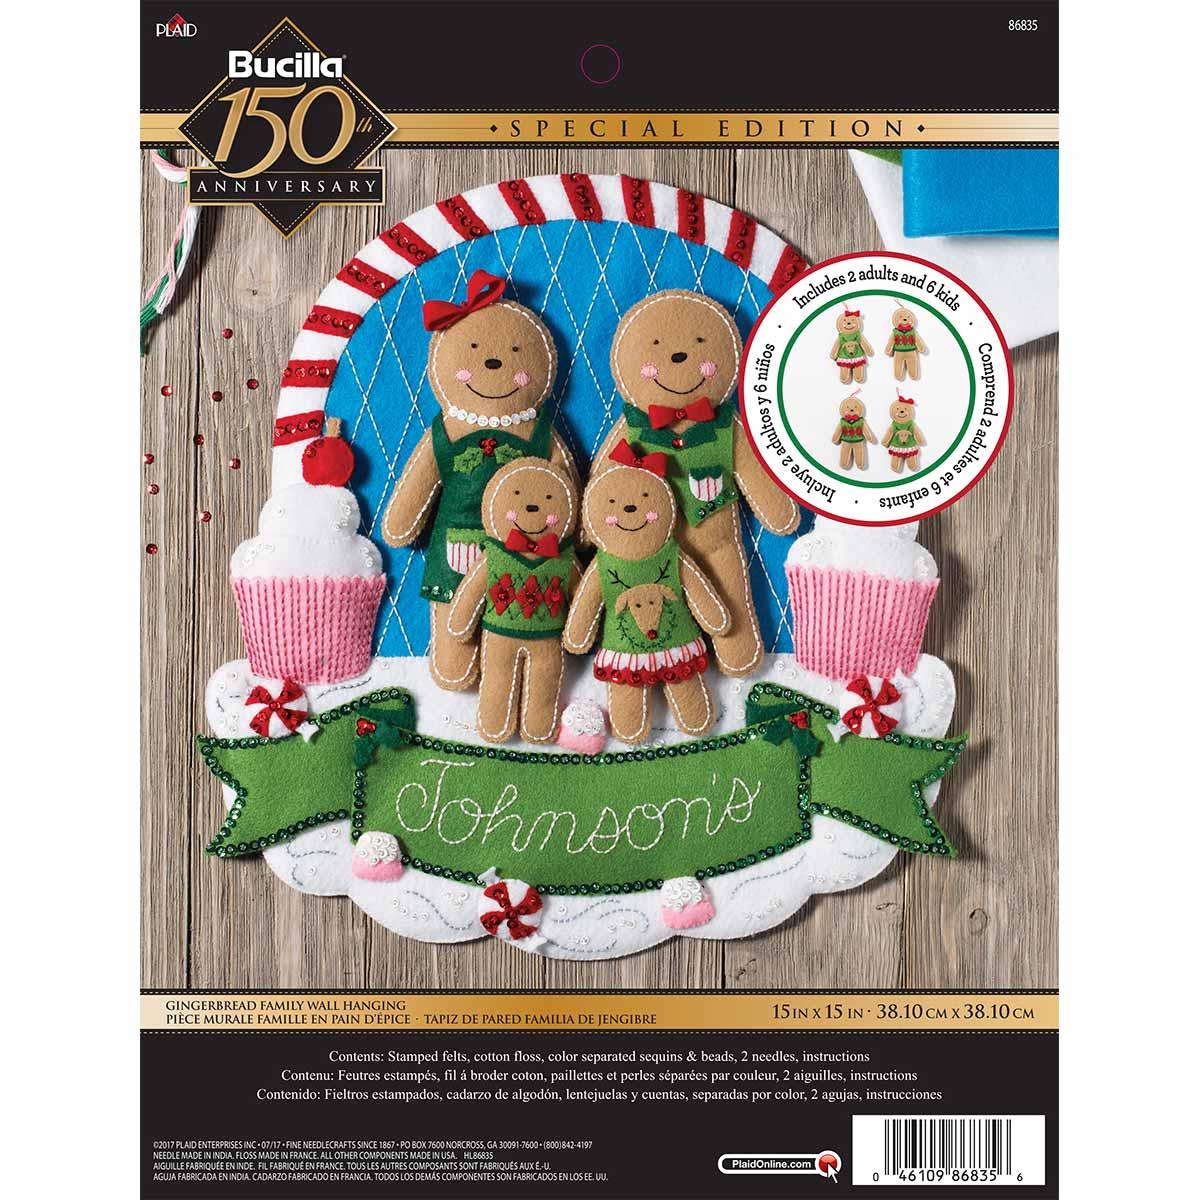 Bucilla ® Seasonal - Felt - Home Decor - Door/Wall Hanging Kits - Gingerbread Family